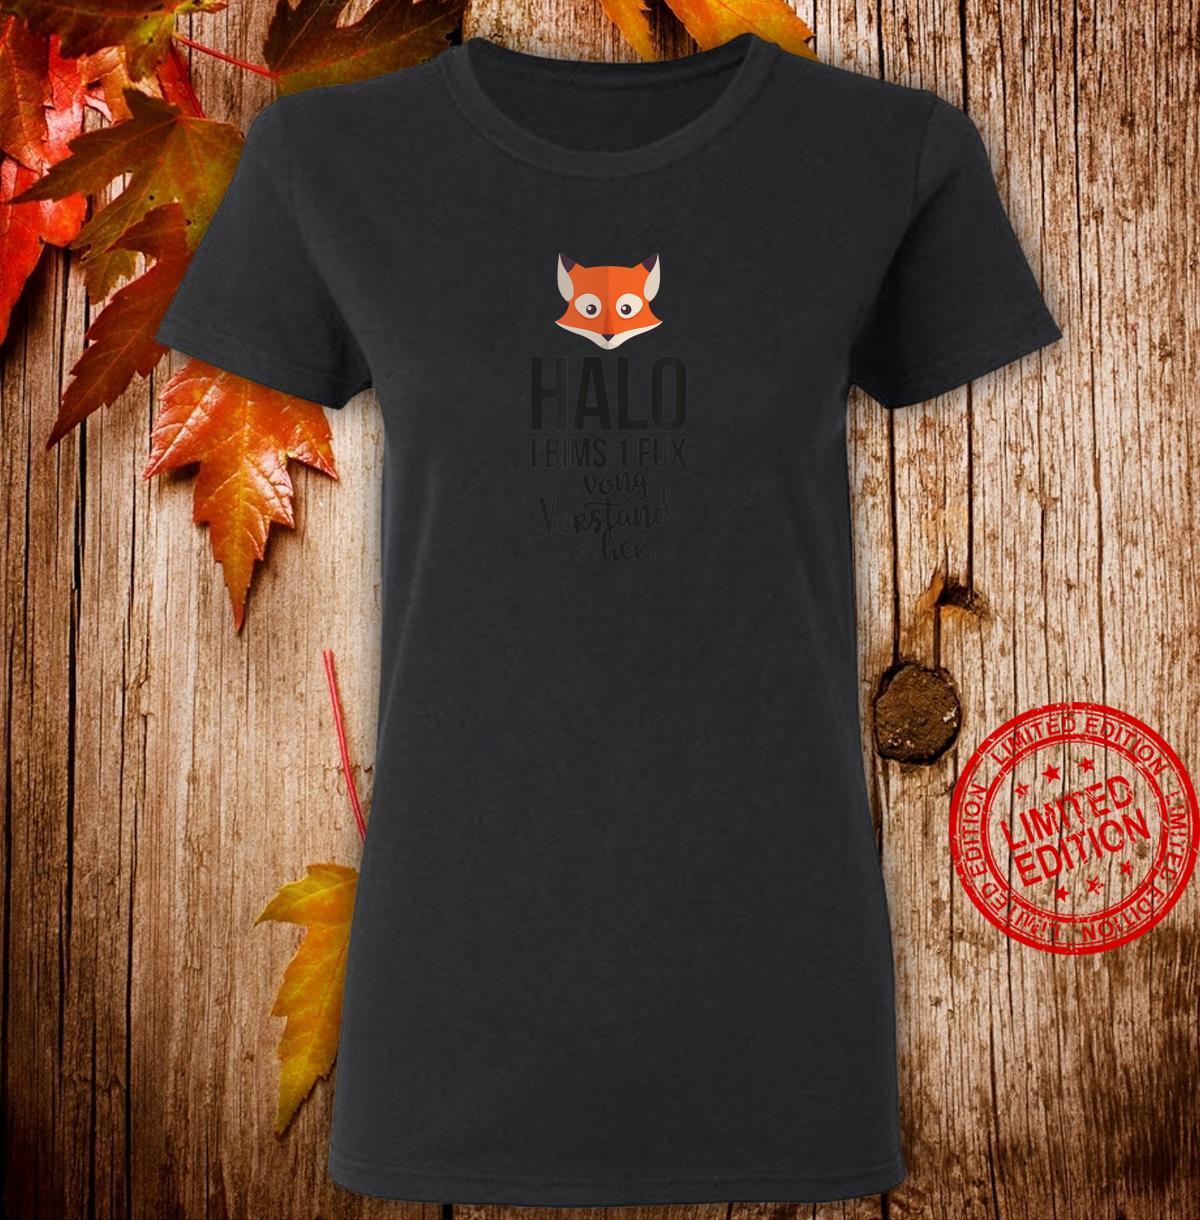 Halo I bims 1 Fux vong Verstand her Lustiges Fun Party Shirt ladies tee